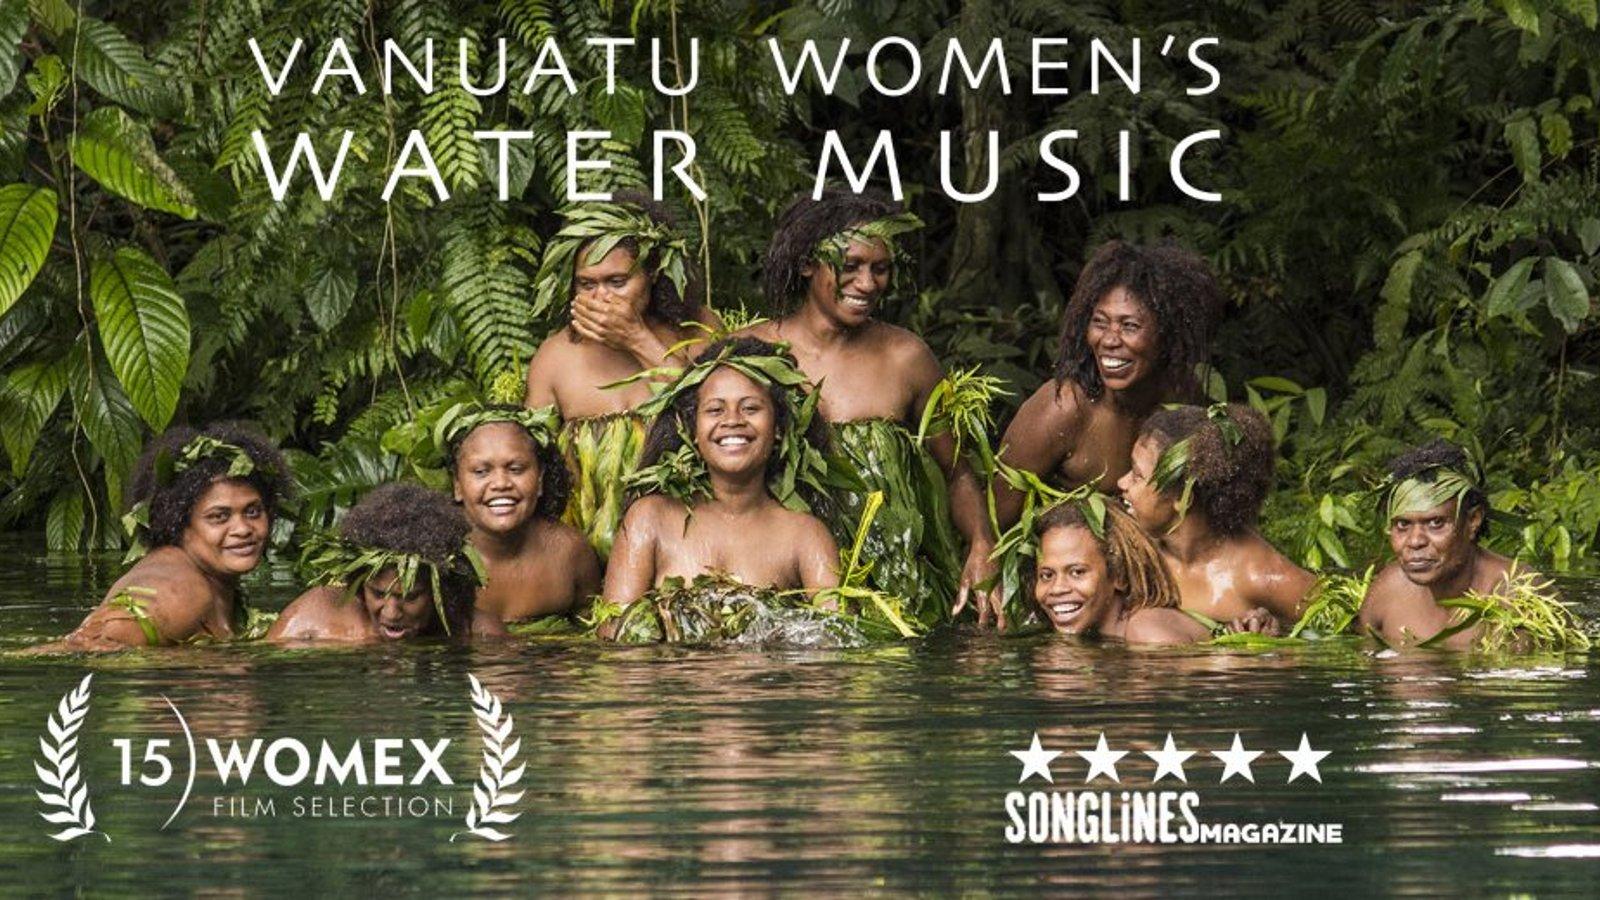 Vanuatu Women's Water Music - An Audio-Visual Journey Deep into Pacific Island Culture